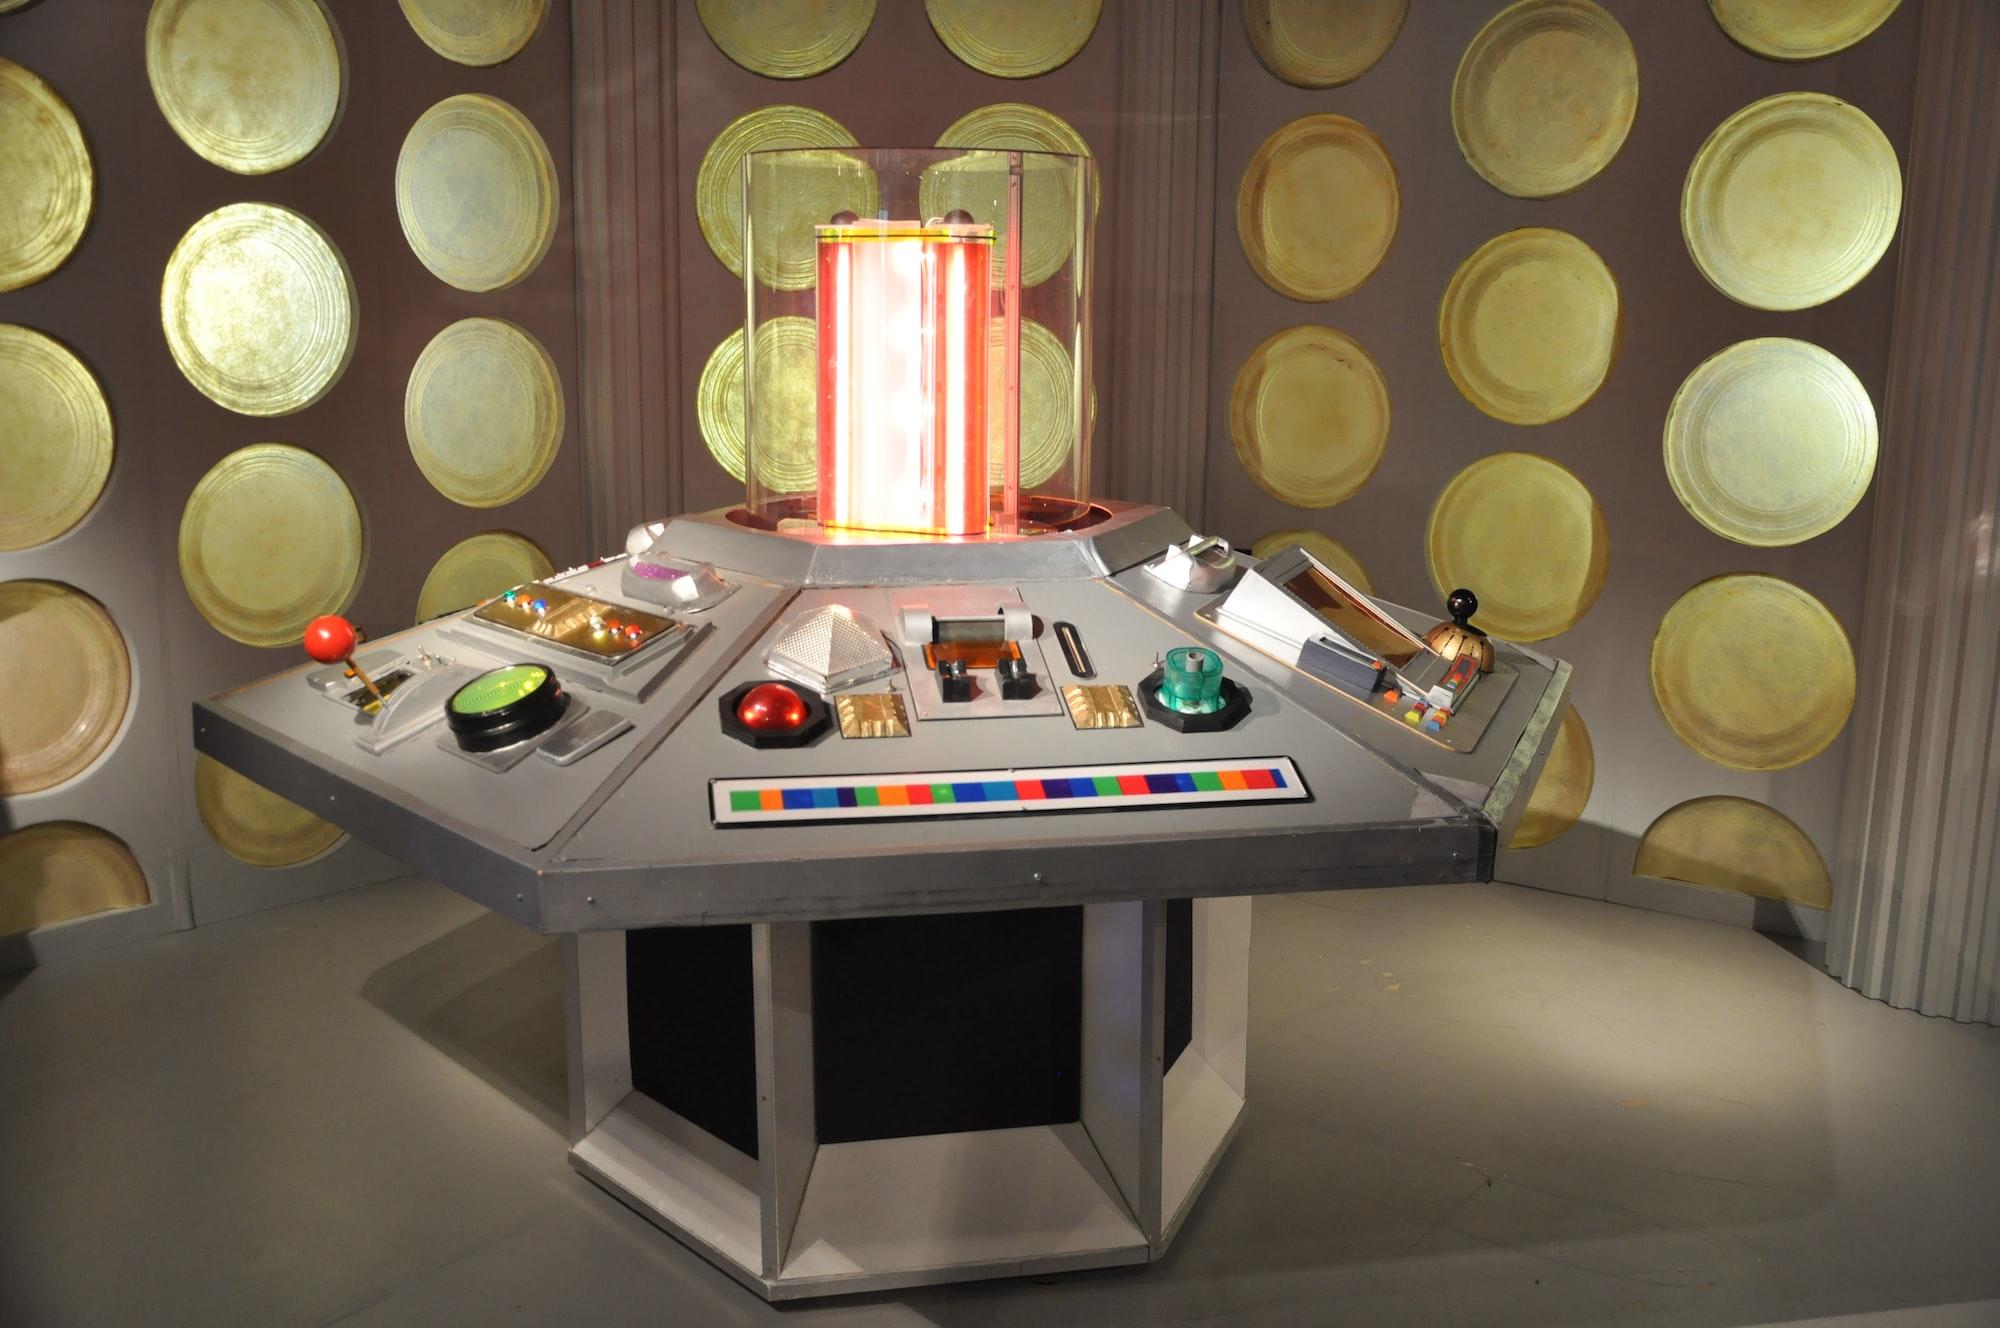 Stream Doctor Who Series 13 on BBC iPlayer